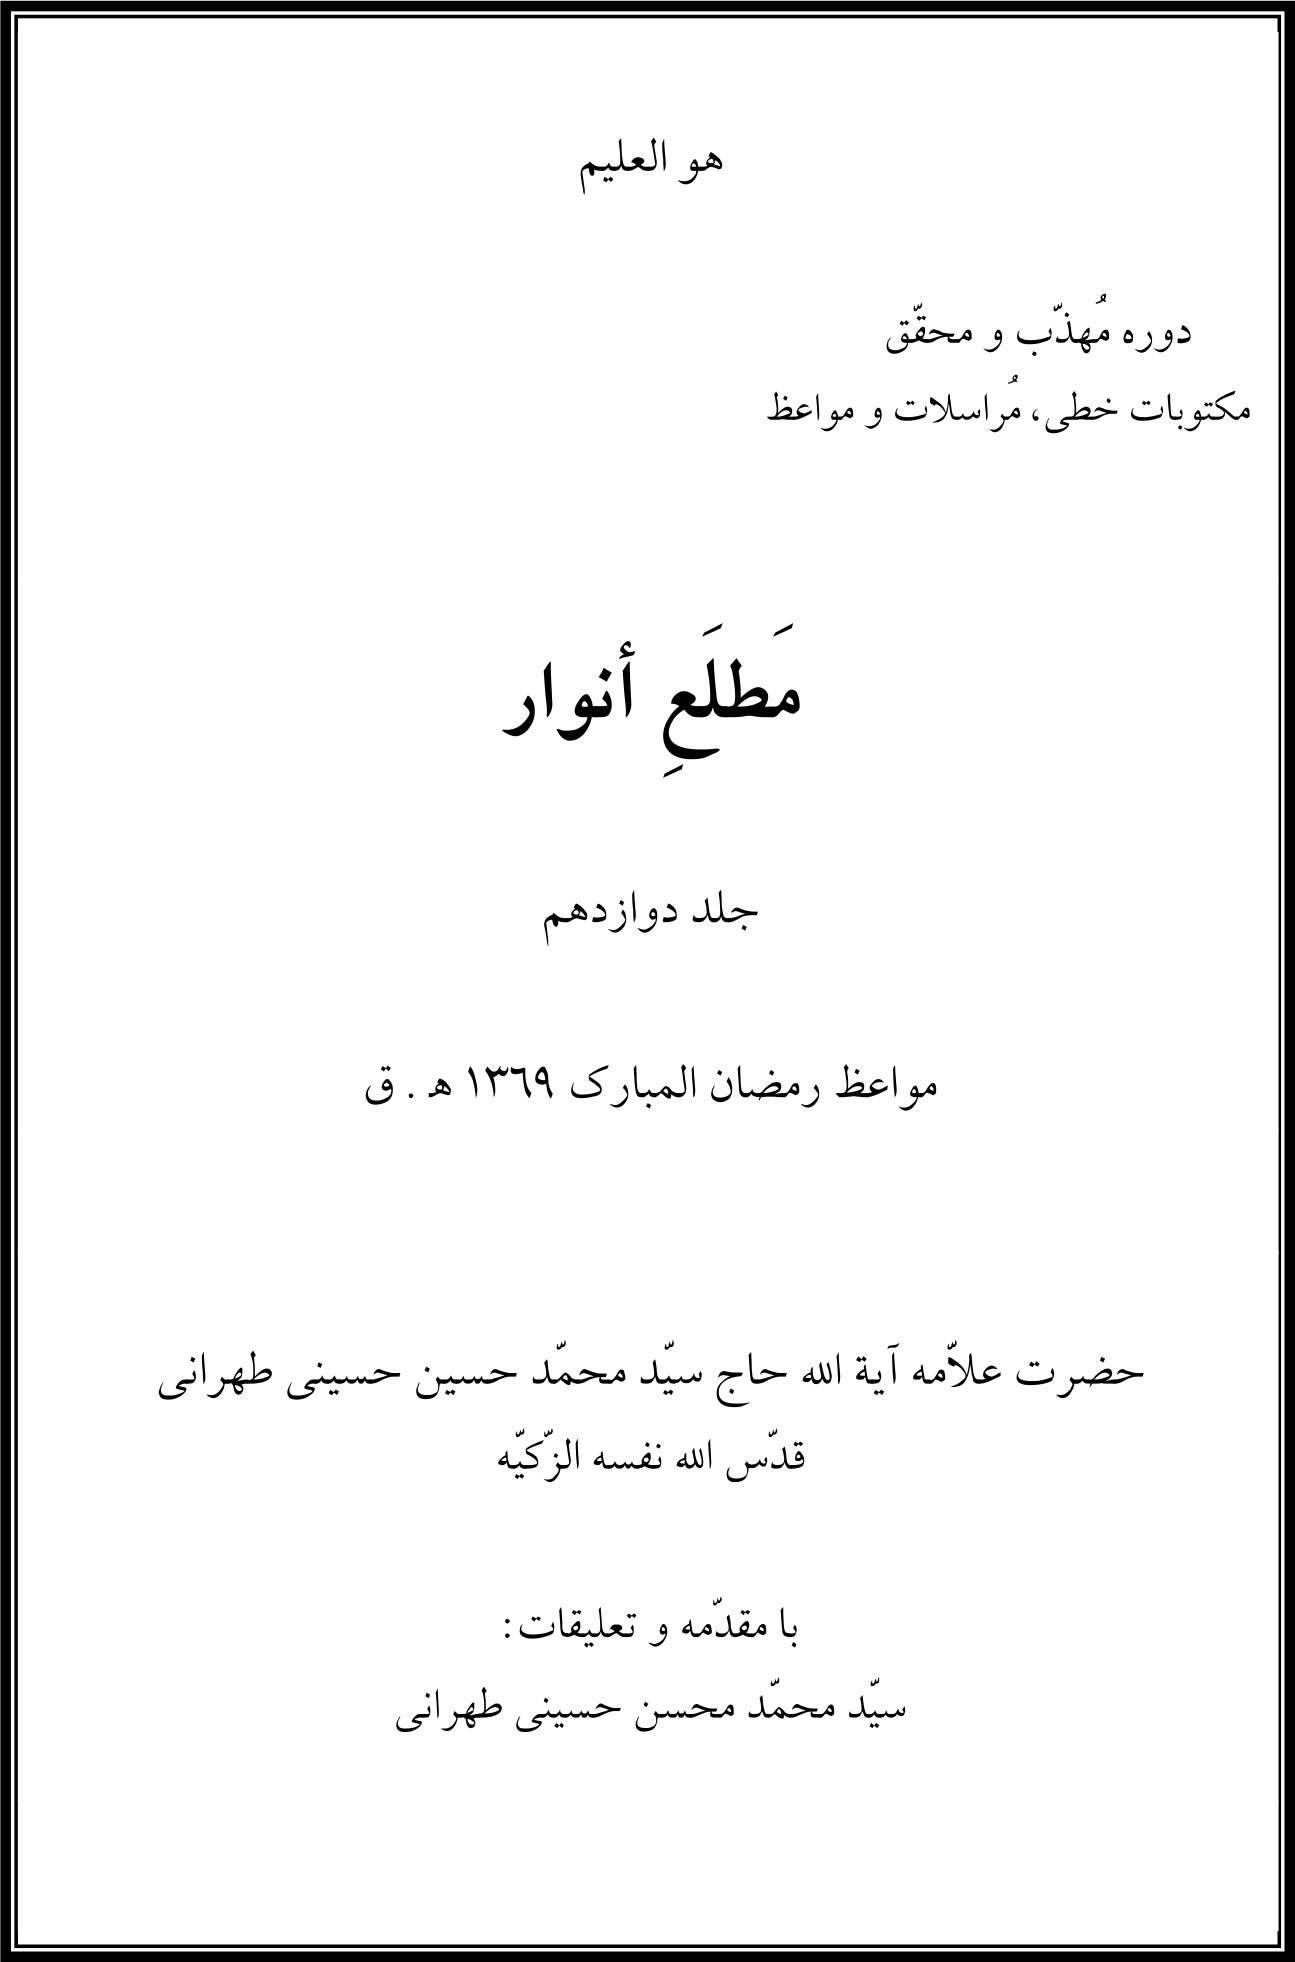 مطلع انوار ،جلد 12، علامه طهرانی